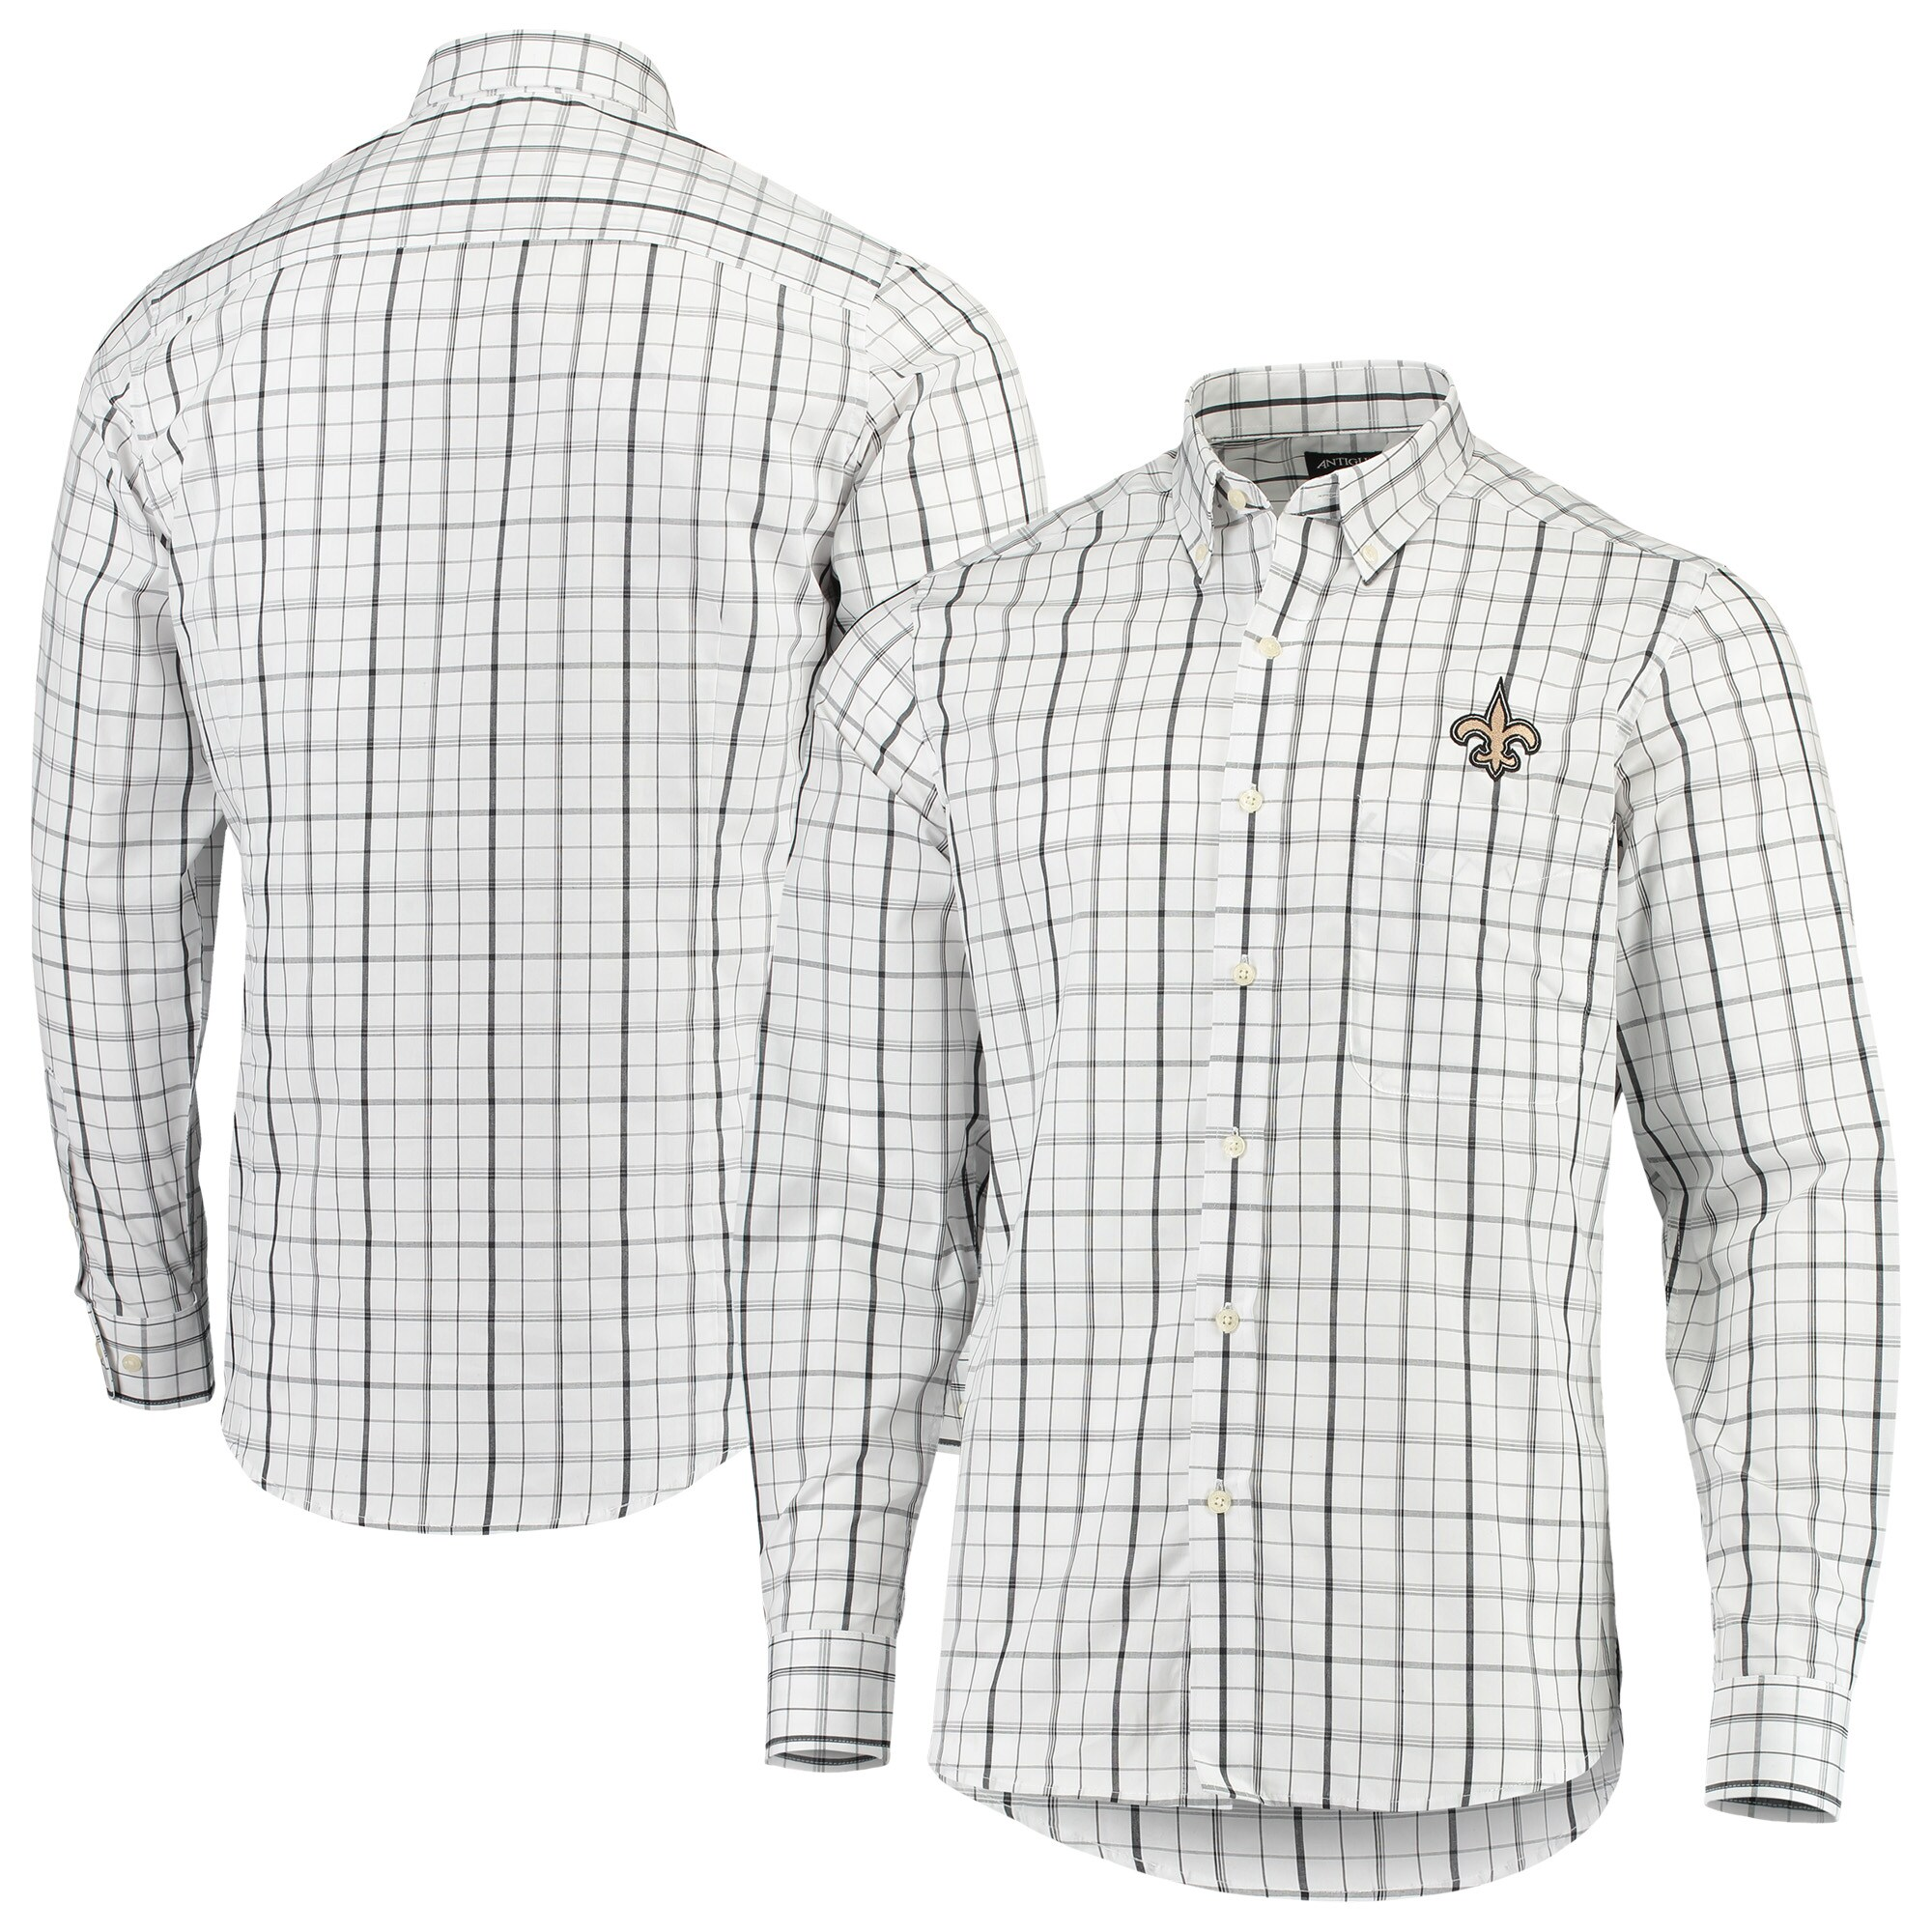 New Orleans Saints Antigua Keen Long Sleeve Button-Down Shirt - White/Black